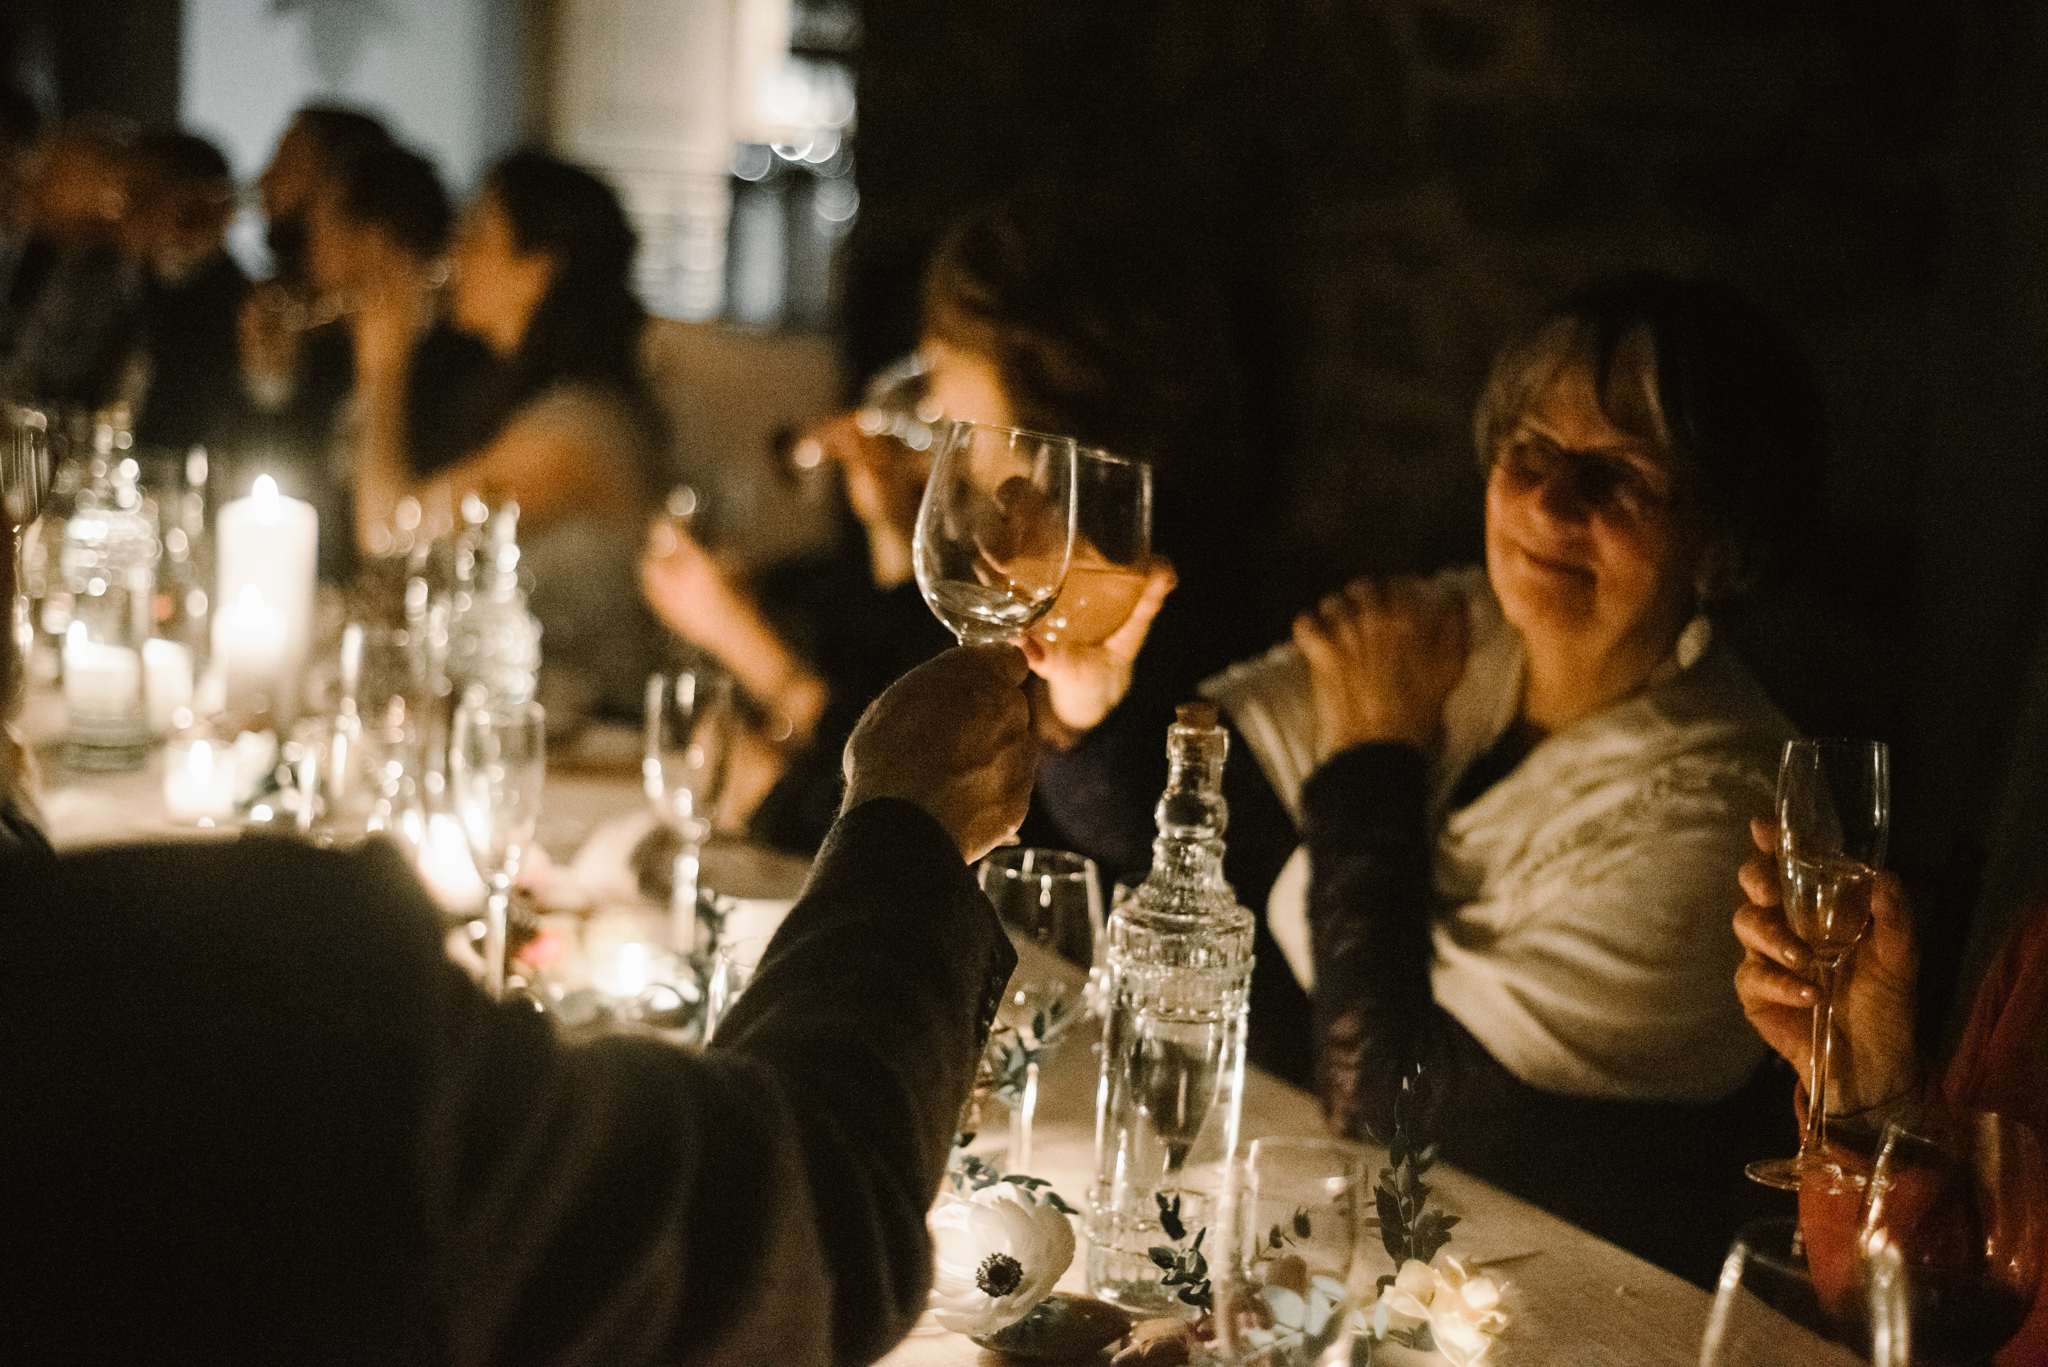 Intimate Dinner Wedding - Small Wedding with Candlelit Dinner - Sperryville Virginia Wedding - Backyard Wedding - Flourish Root Wedding Flowers - White Sails Creative Wedding - Cozy Wedding - Casual Wedding - Intimate Wedding_52.jpg